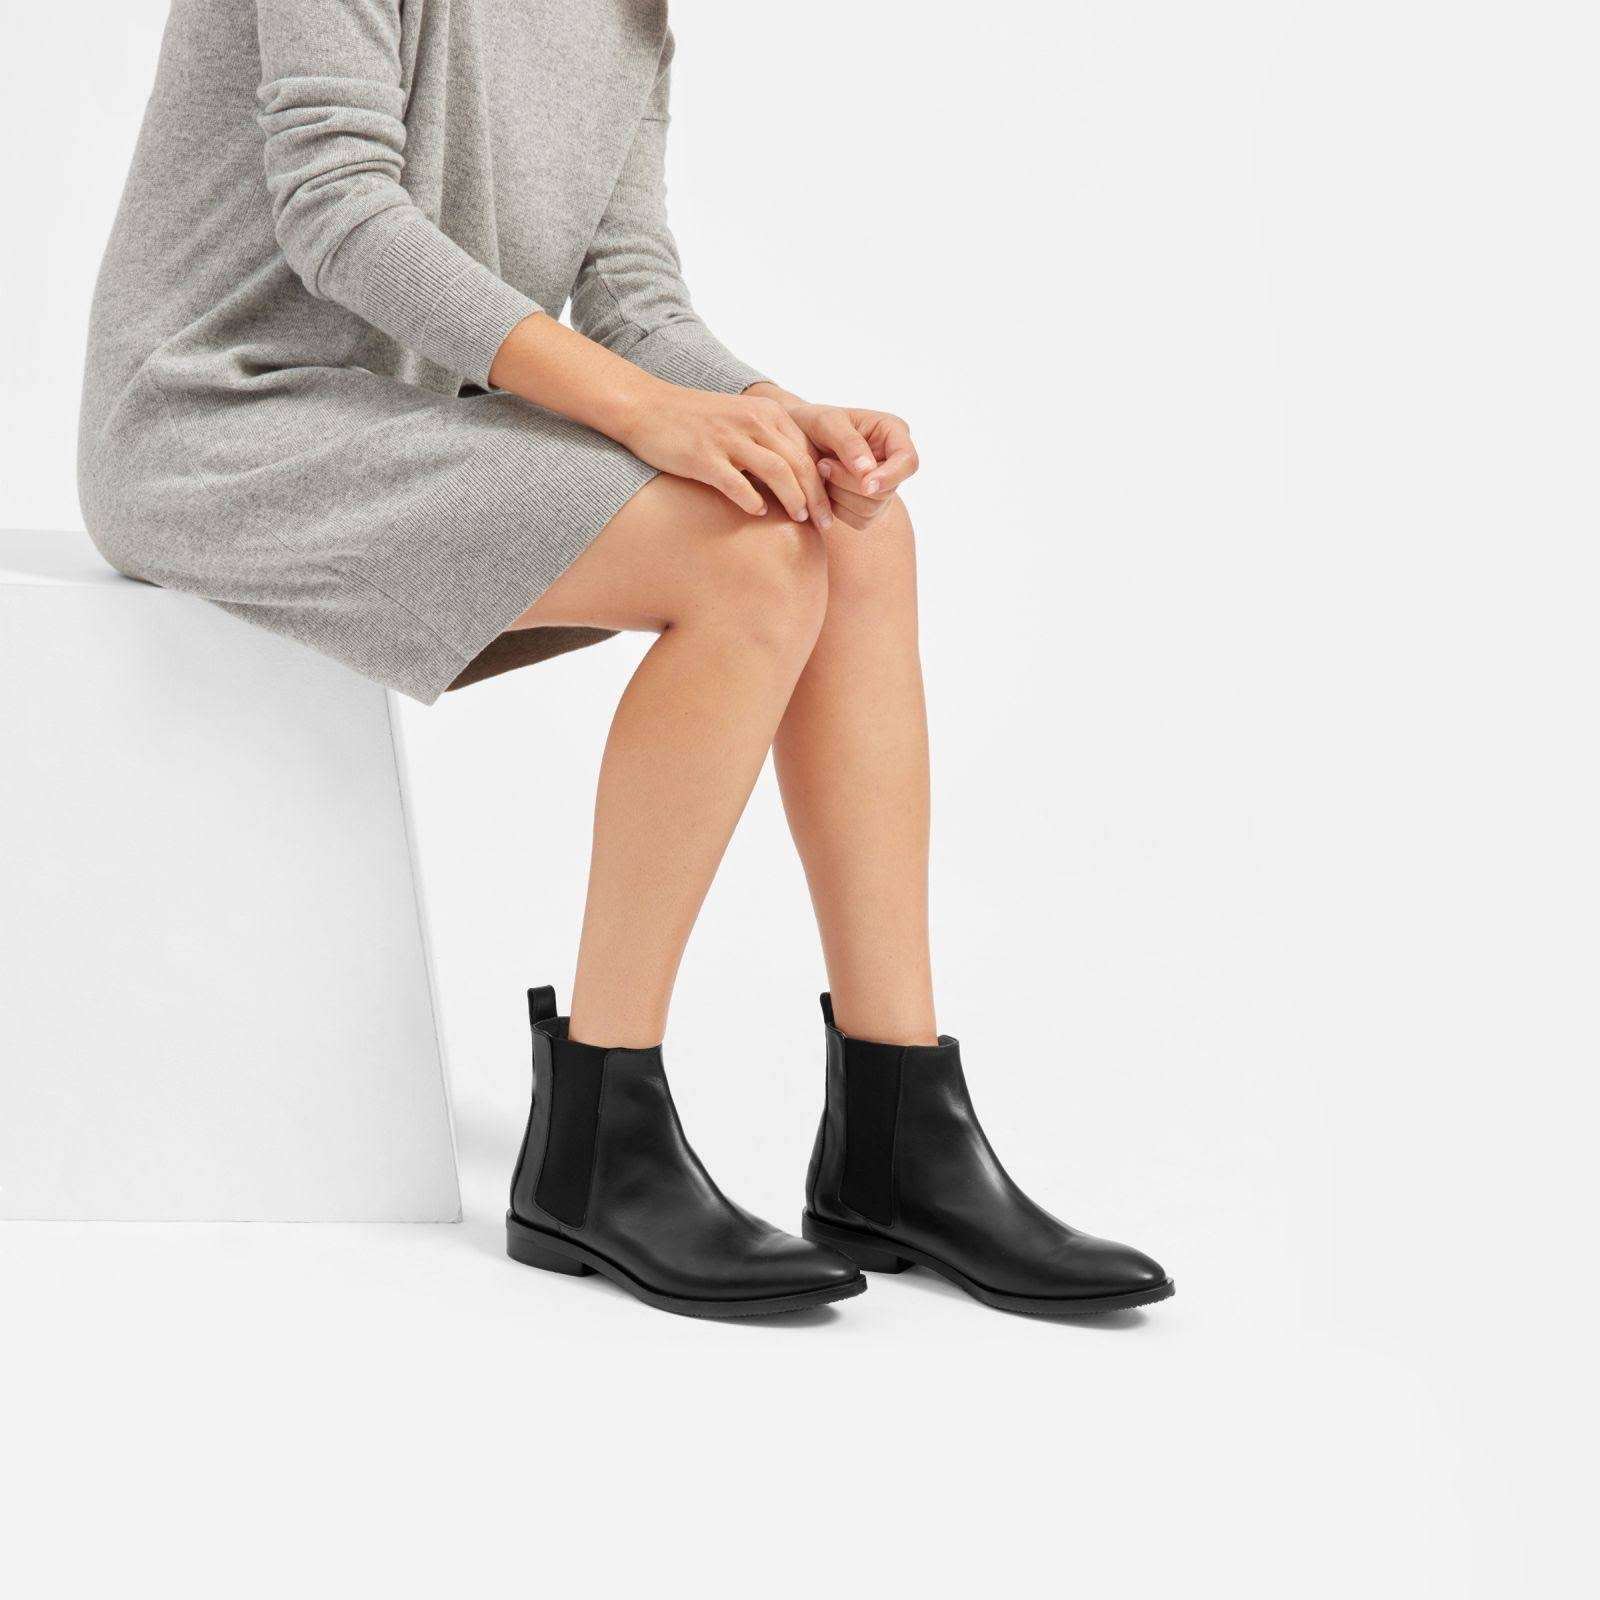 Black Size In By 5 Chelsea Women's Boot Everlane 10 g8XYEIq